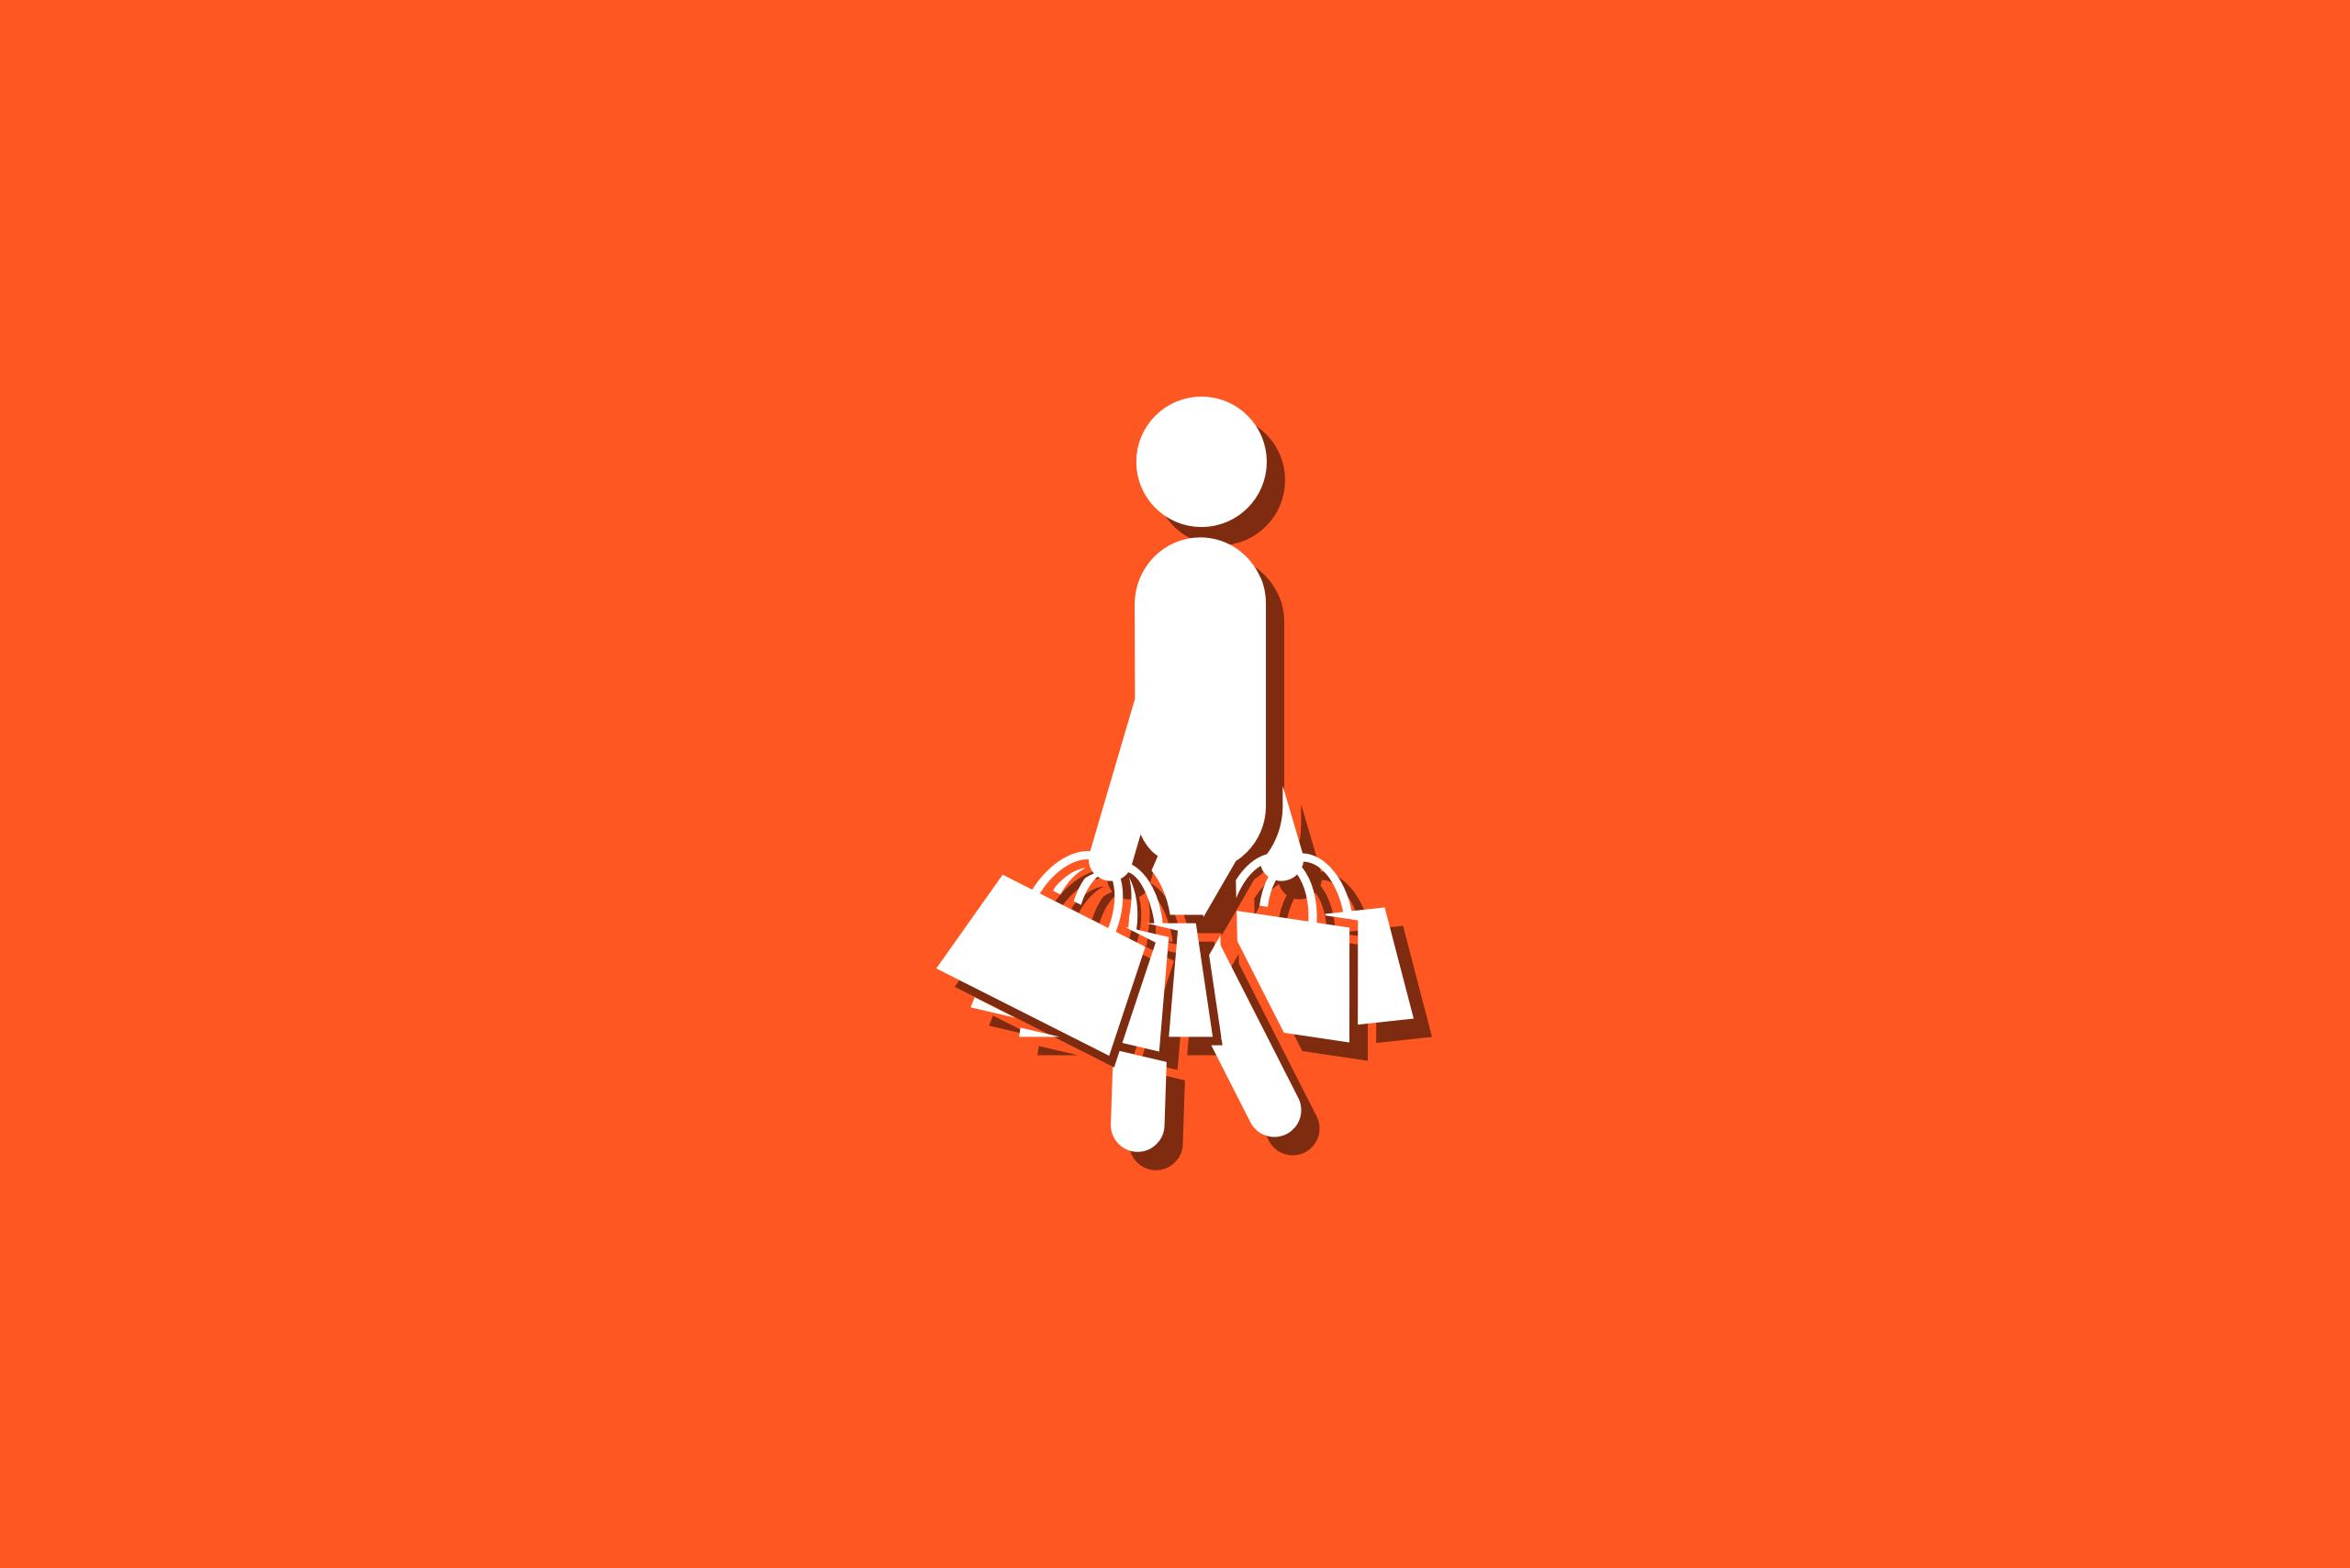 Comprar ropa de marca barata